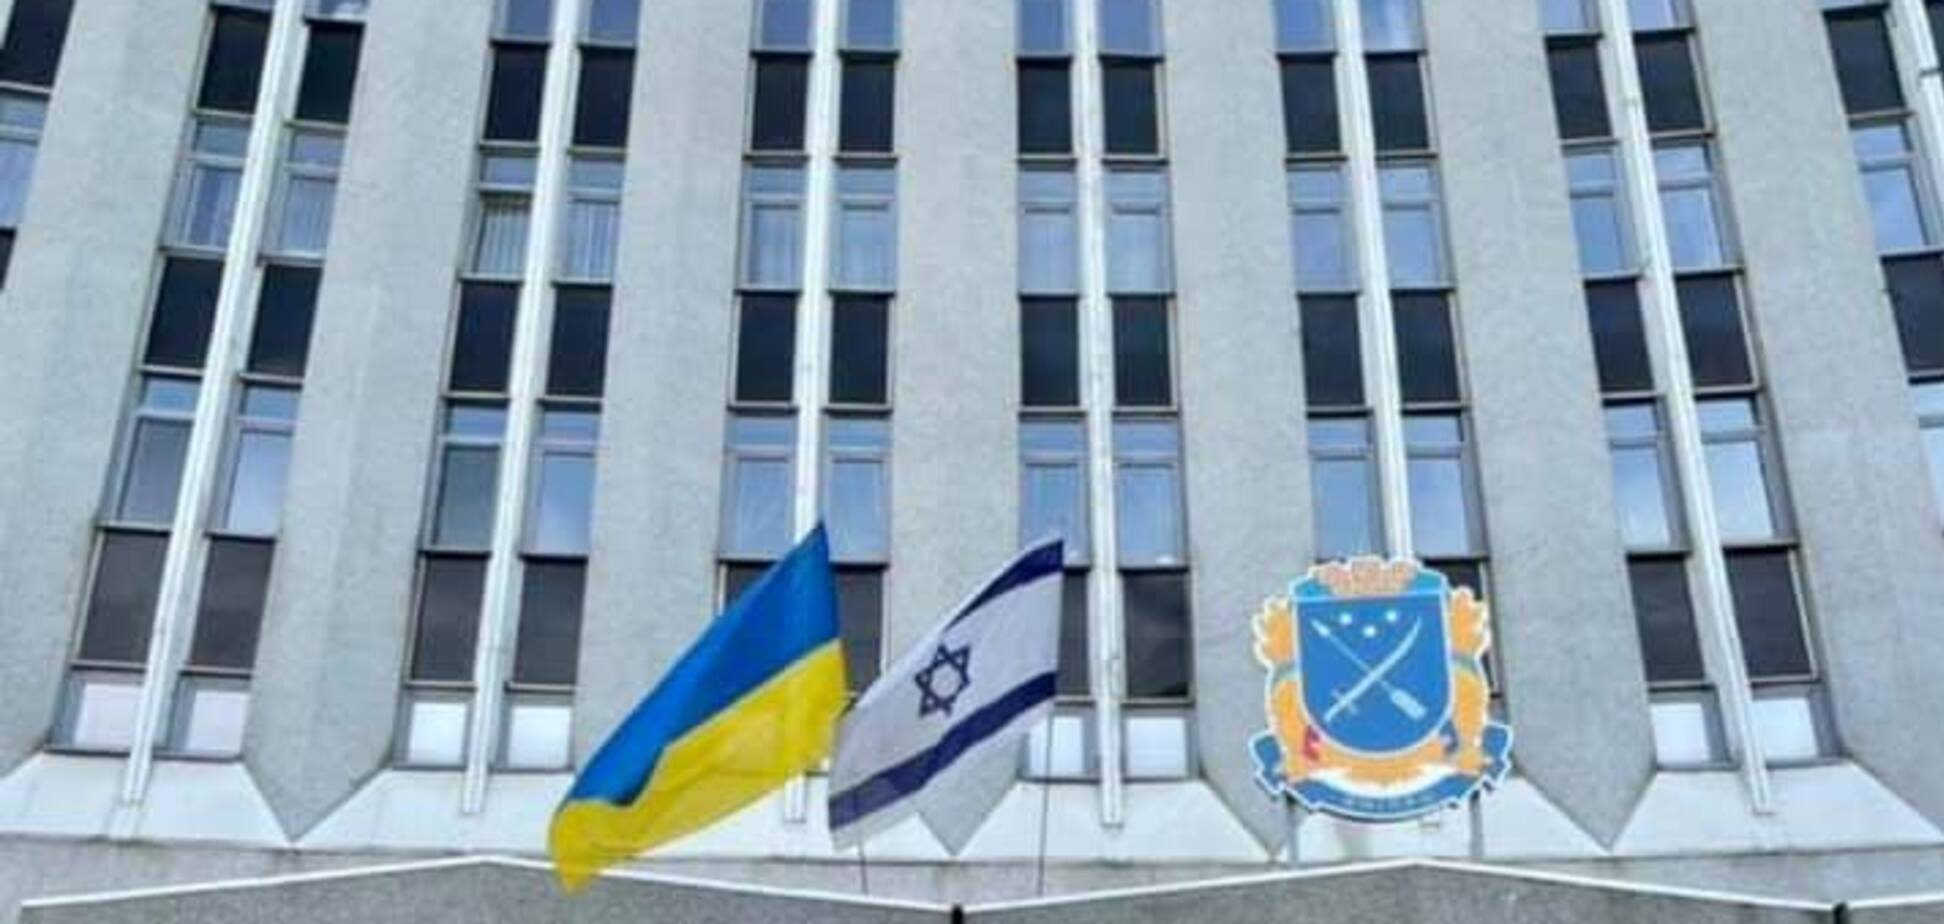 На здании горсовета Днепра вывесили флаг Израиля